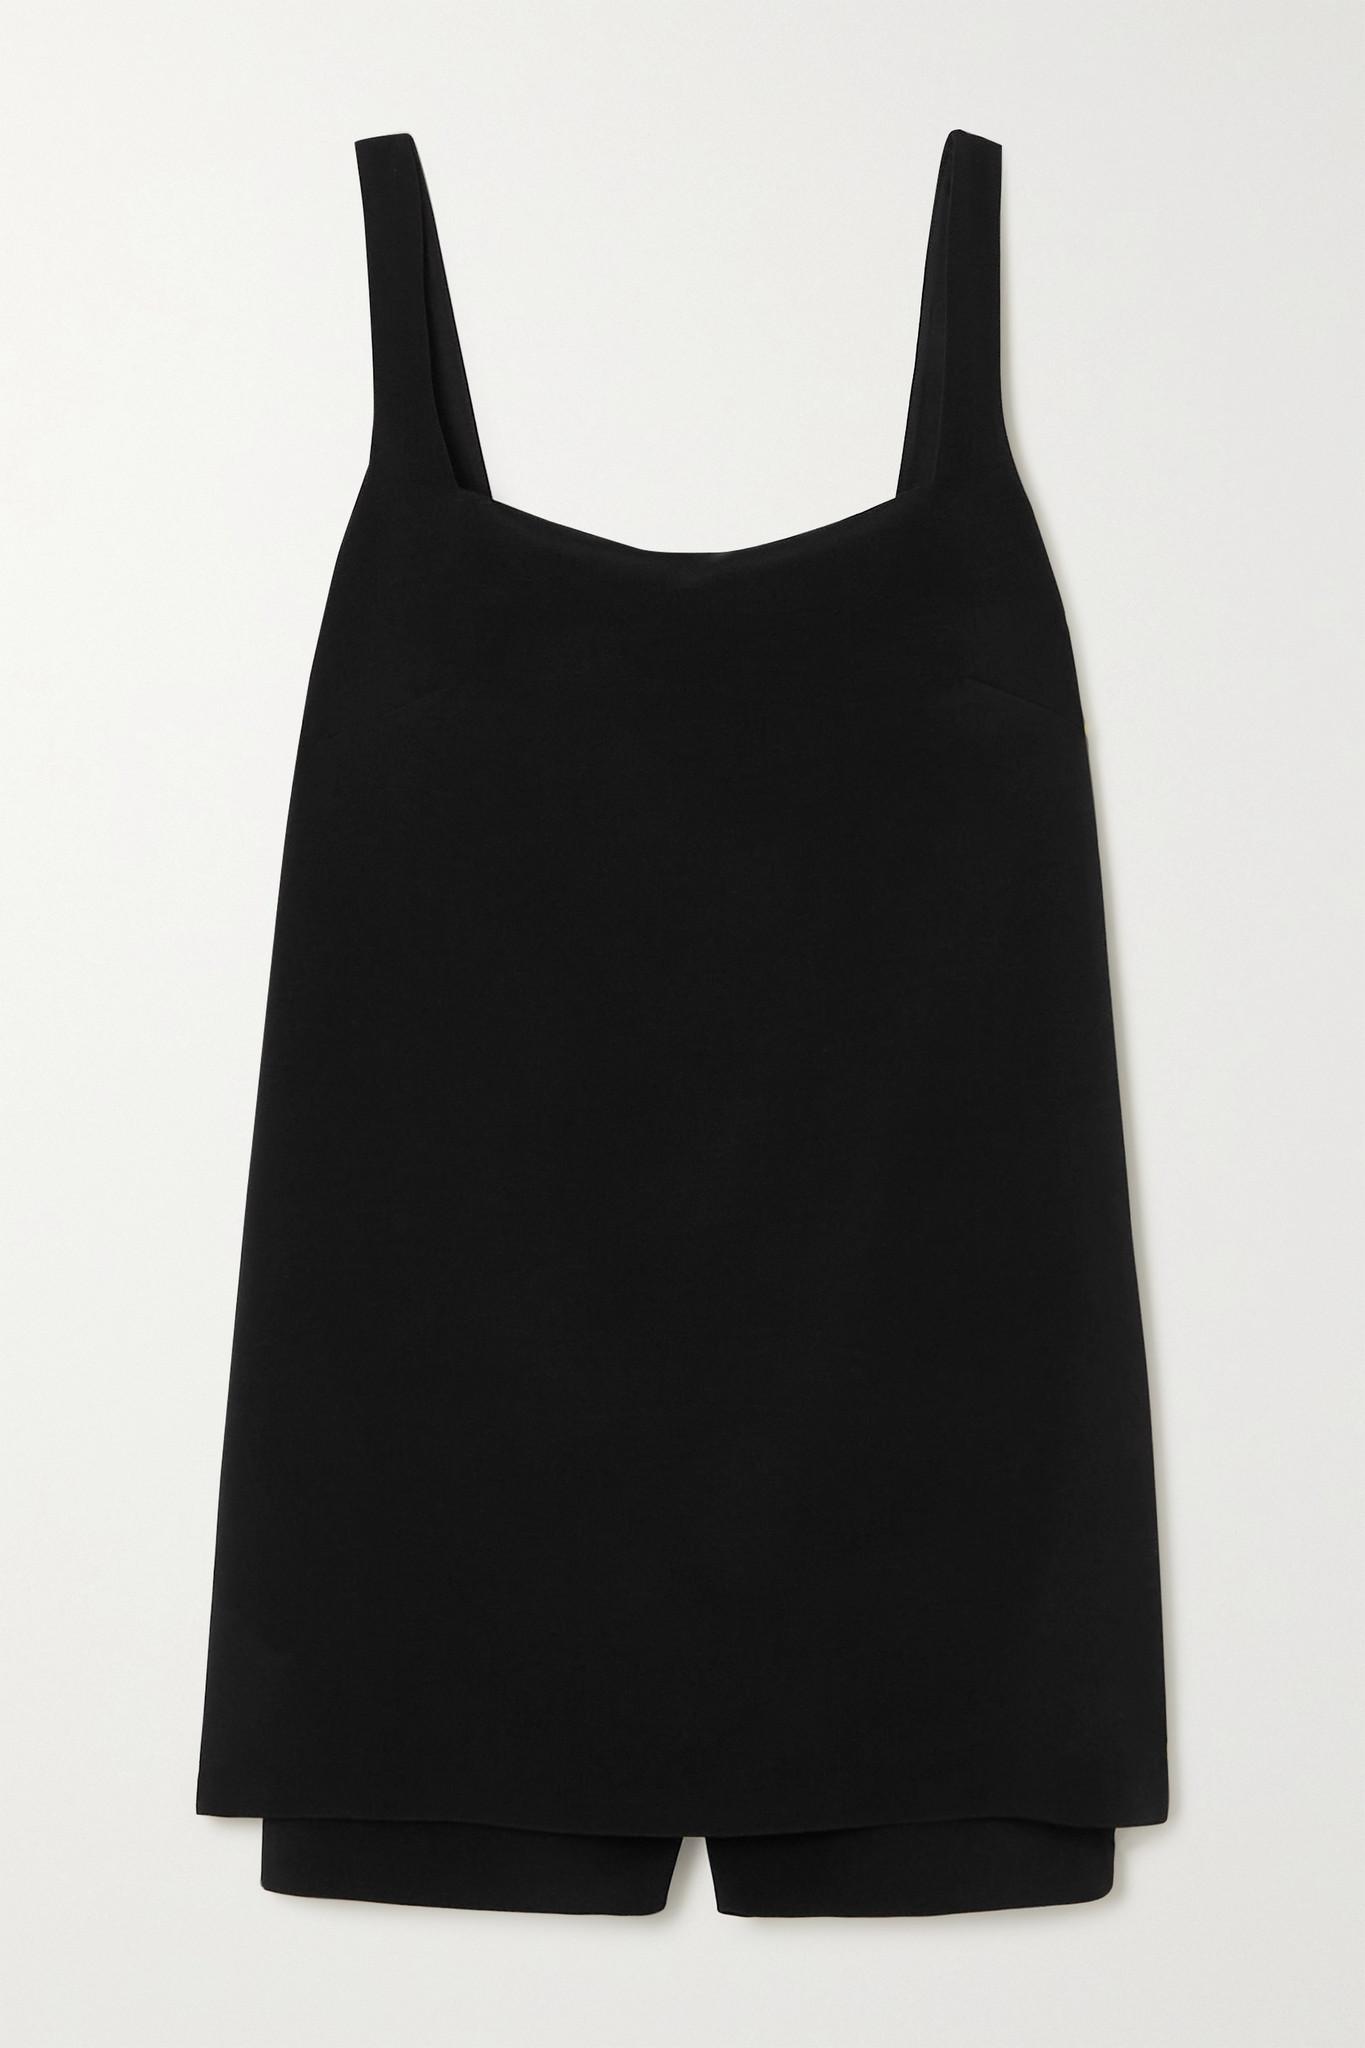 VALENTINO - Layered Wool-blend Crepe Playsuit - Black - IT38